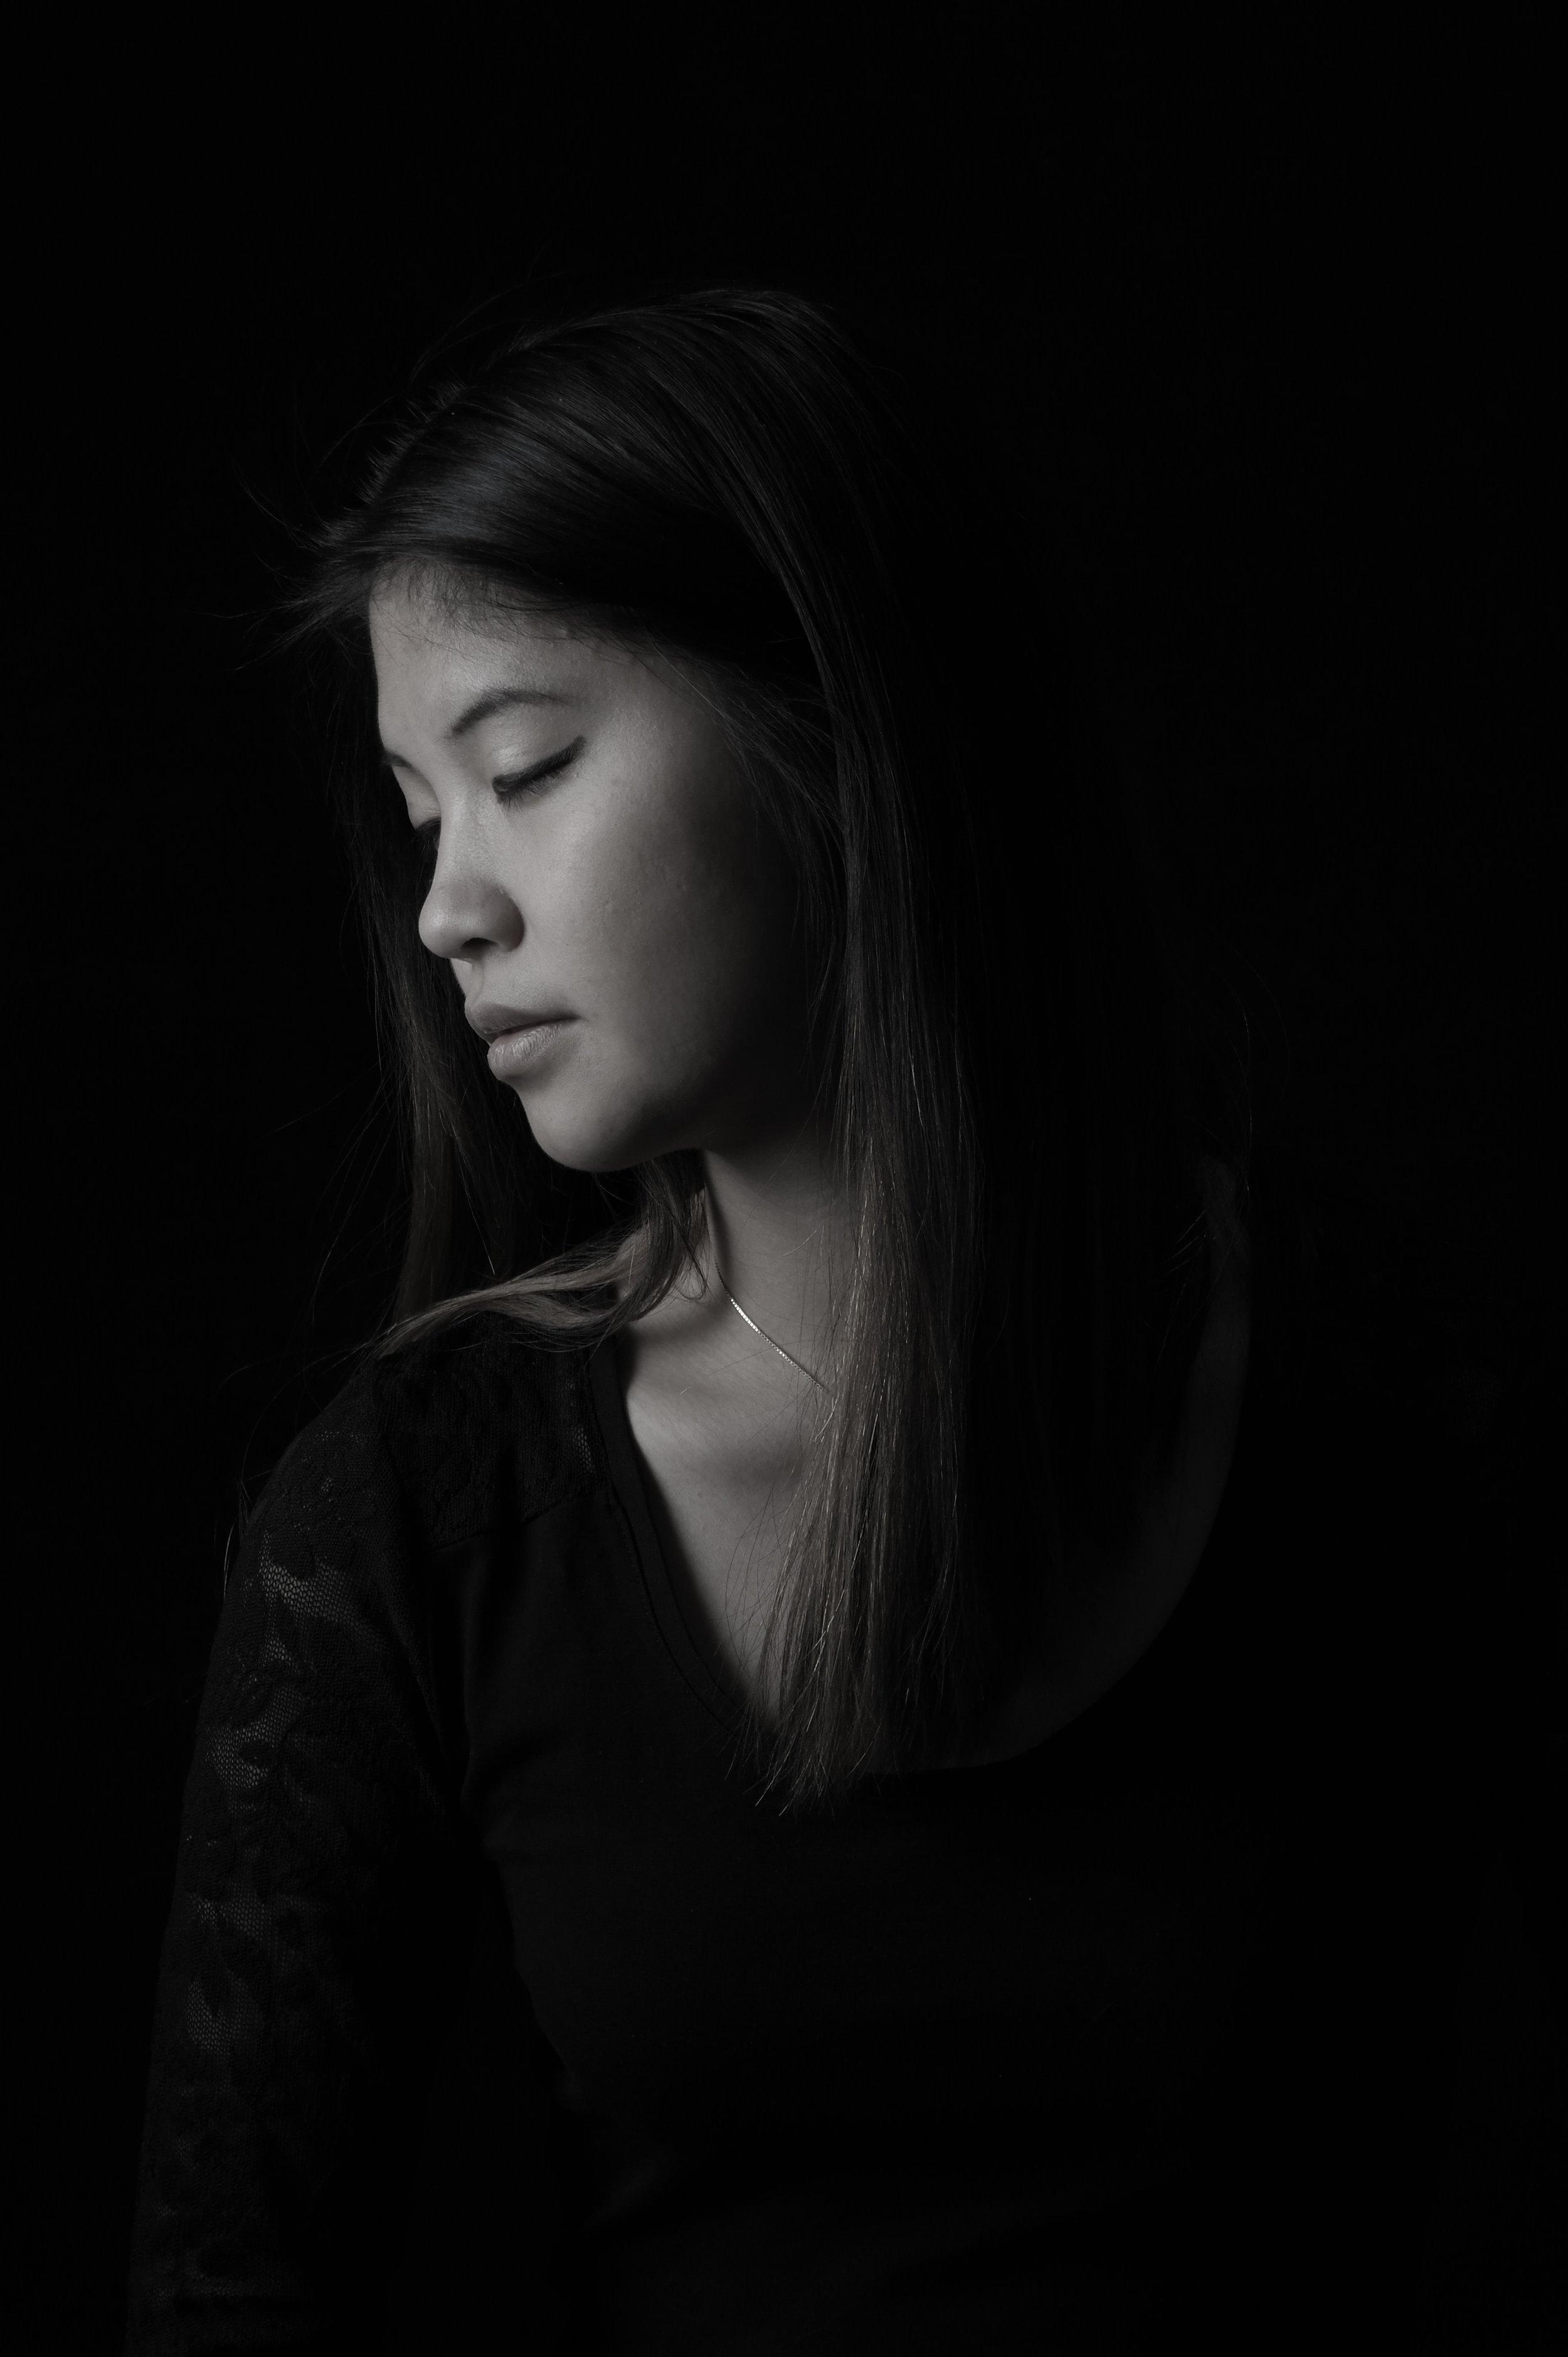 Portret zw (Femke).jpg